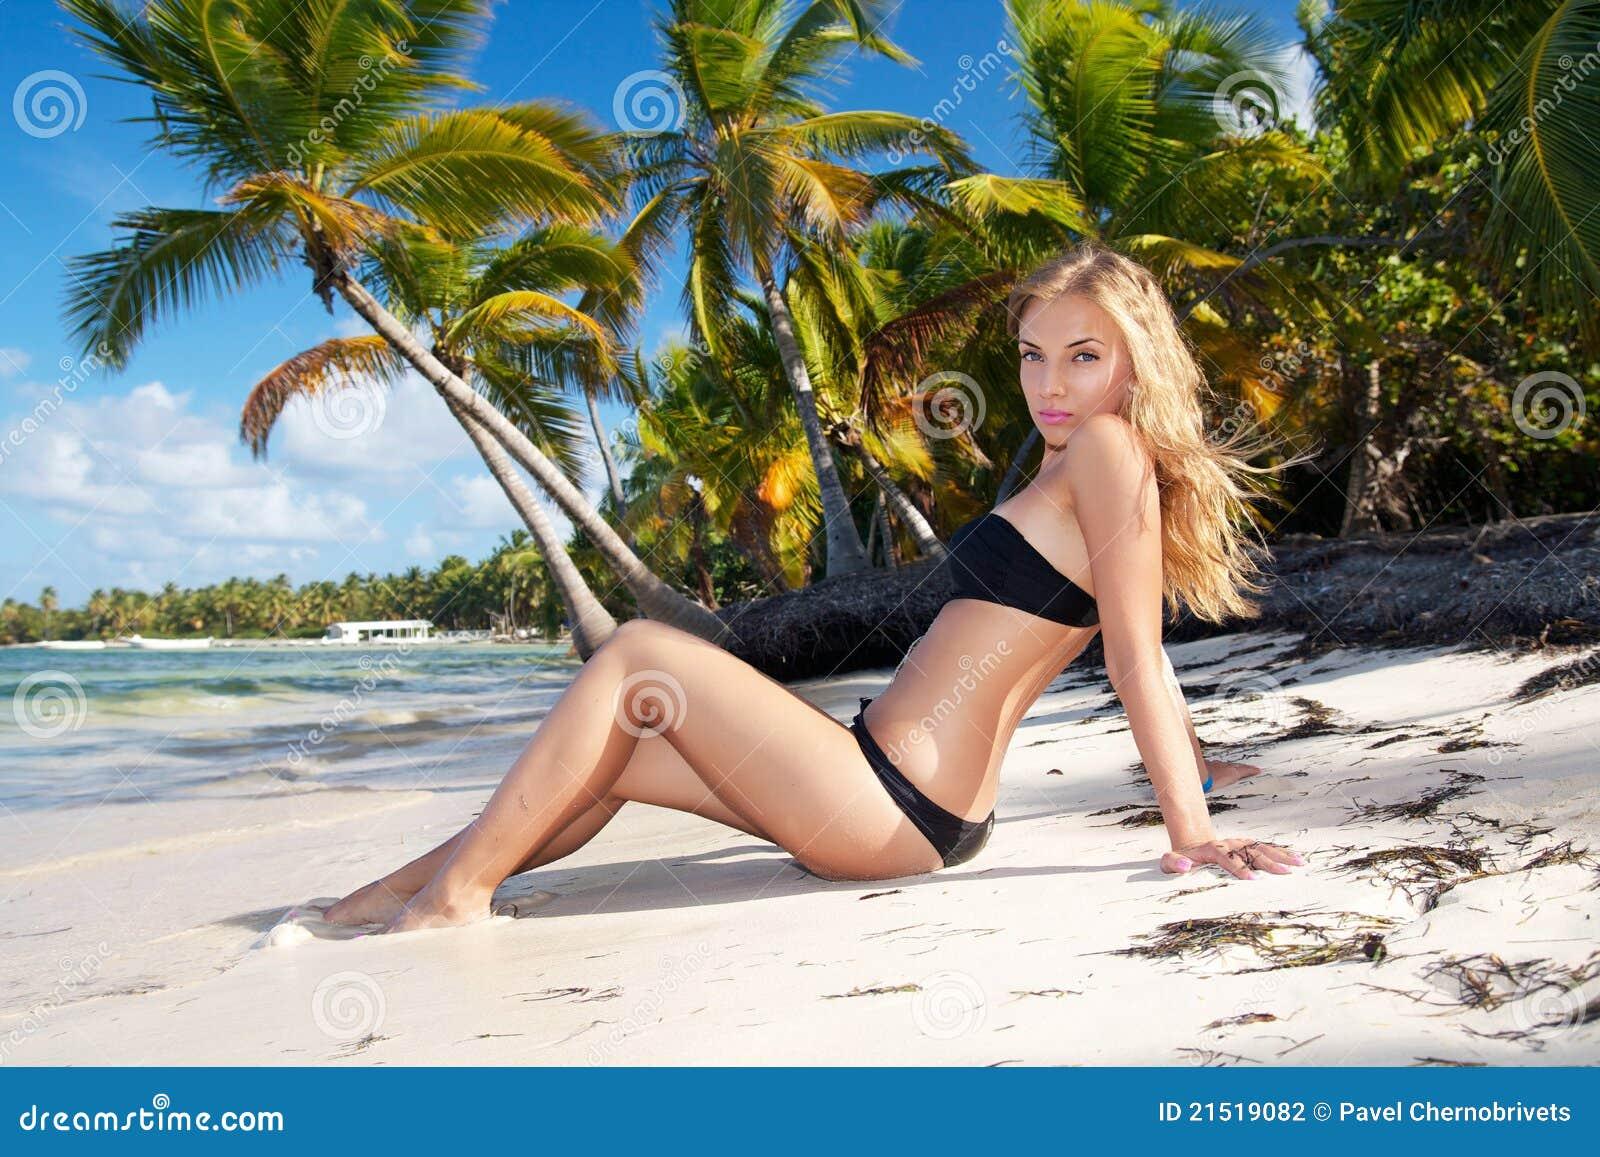 Swimsuit Nude Rude Mature Women Jpg